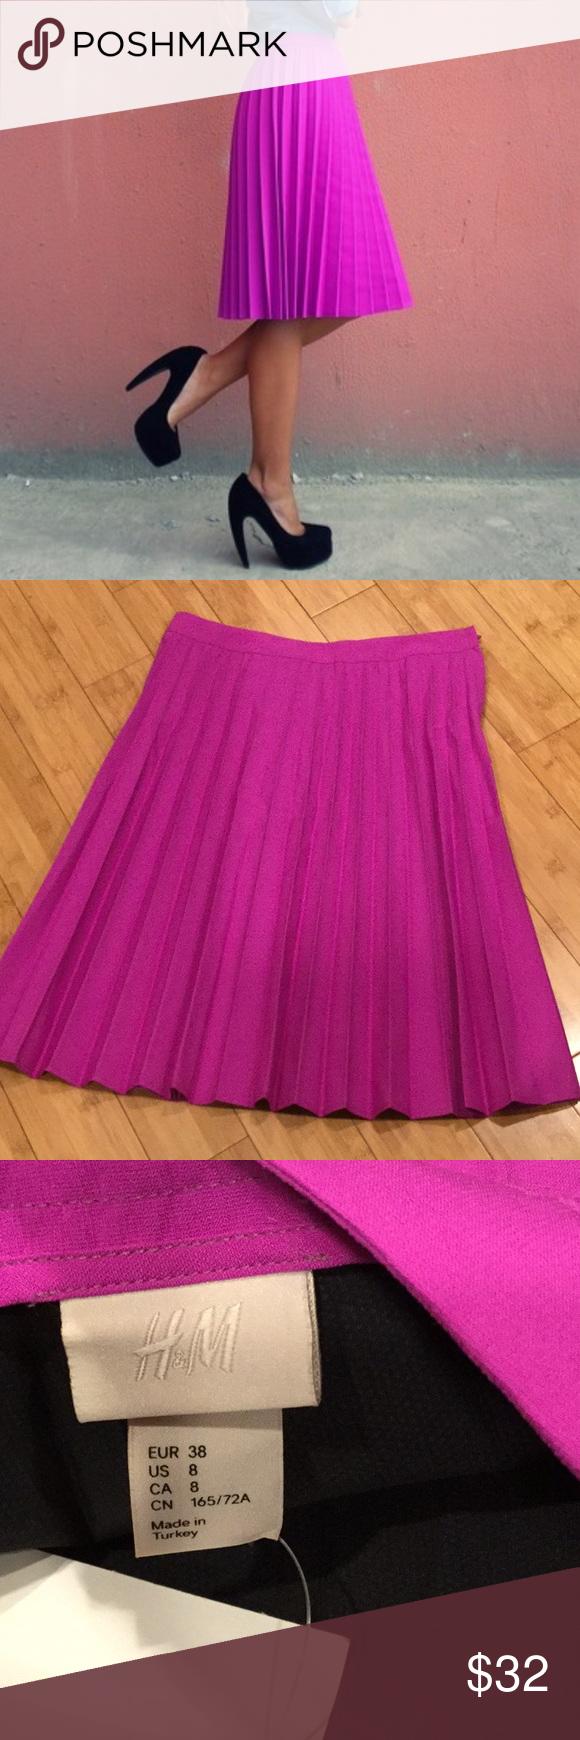 H&m pink pleated dress  HuM pleated skirt Sz  NWT